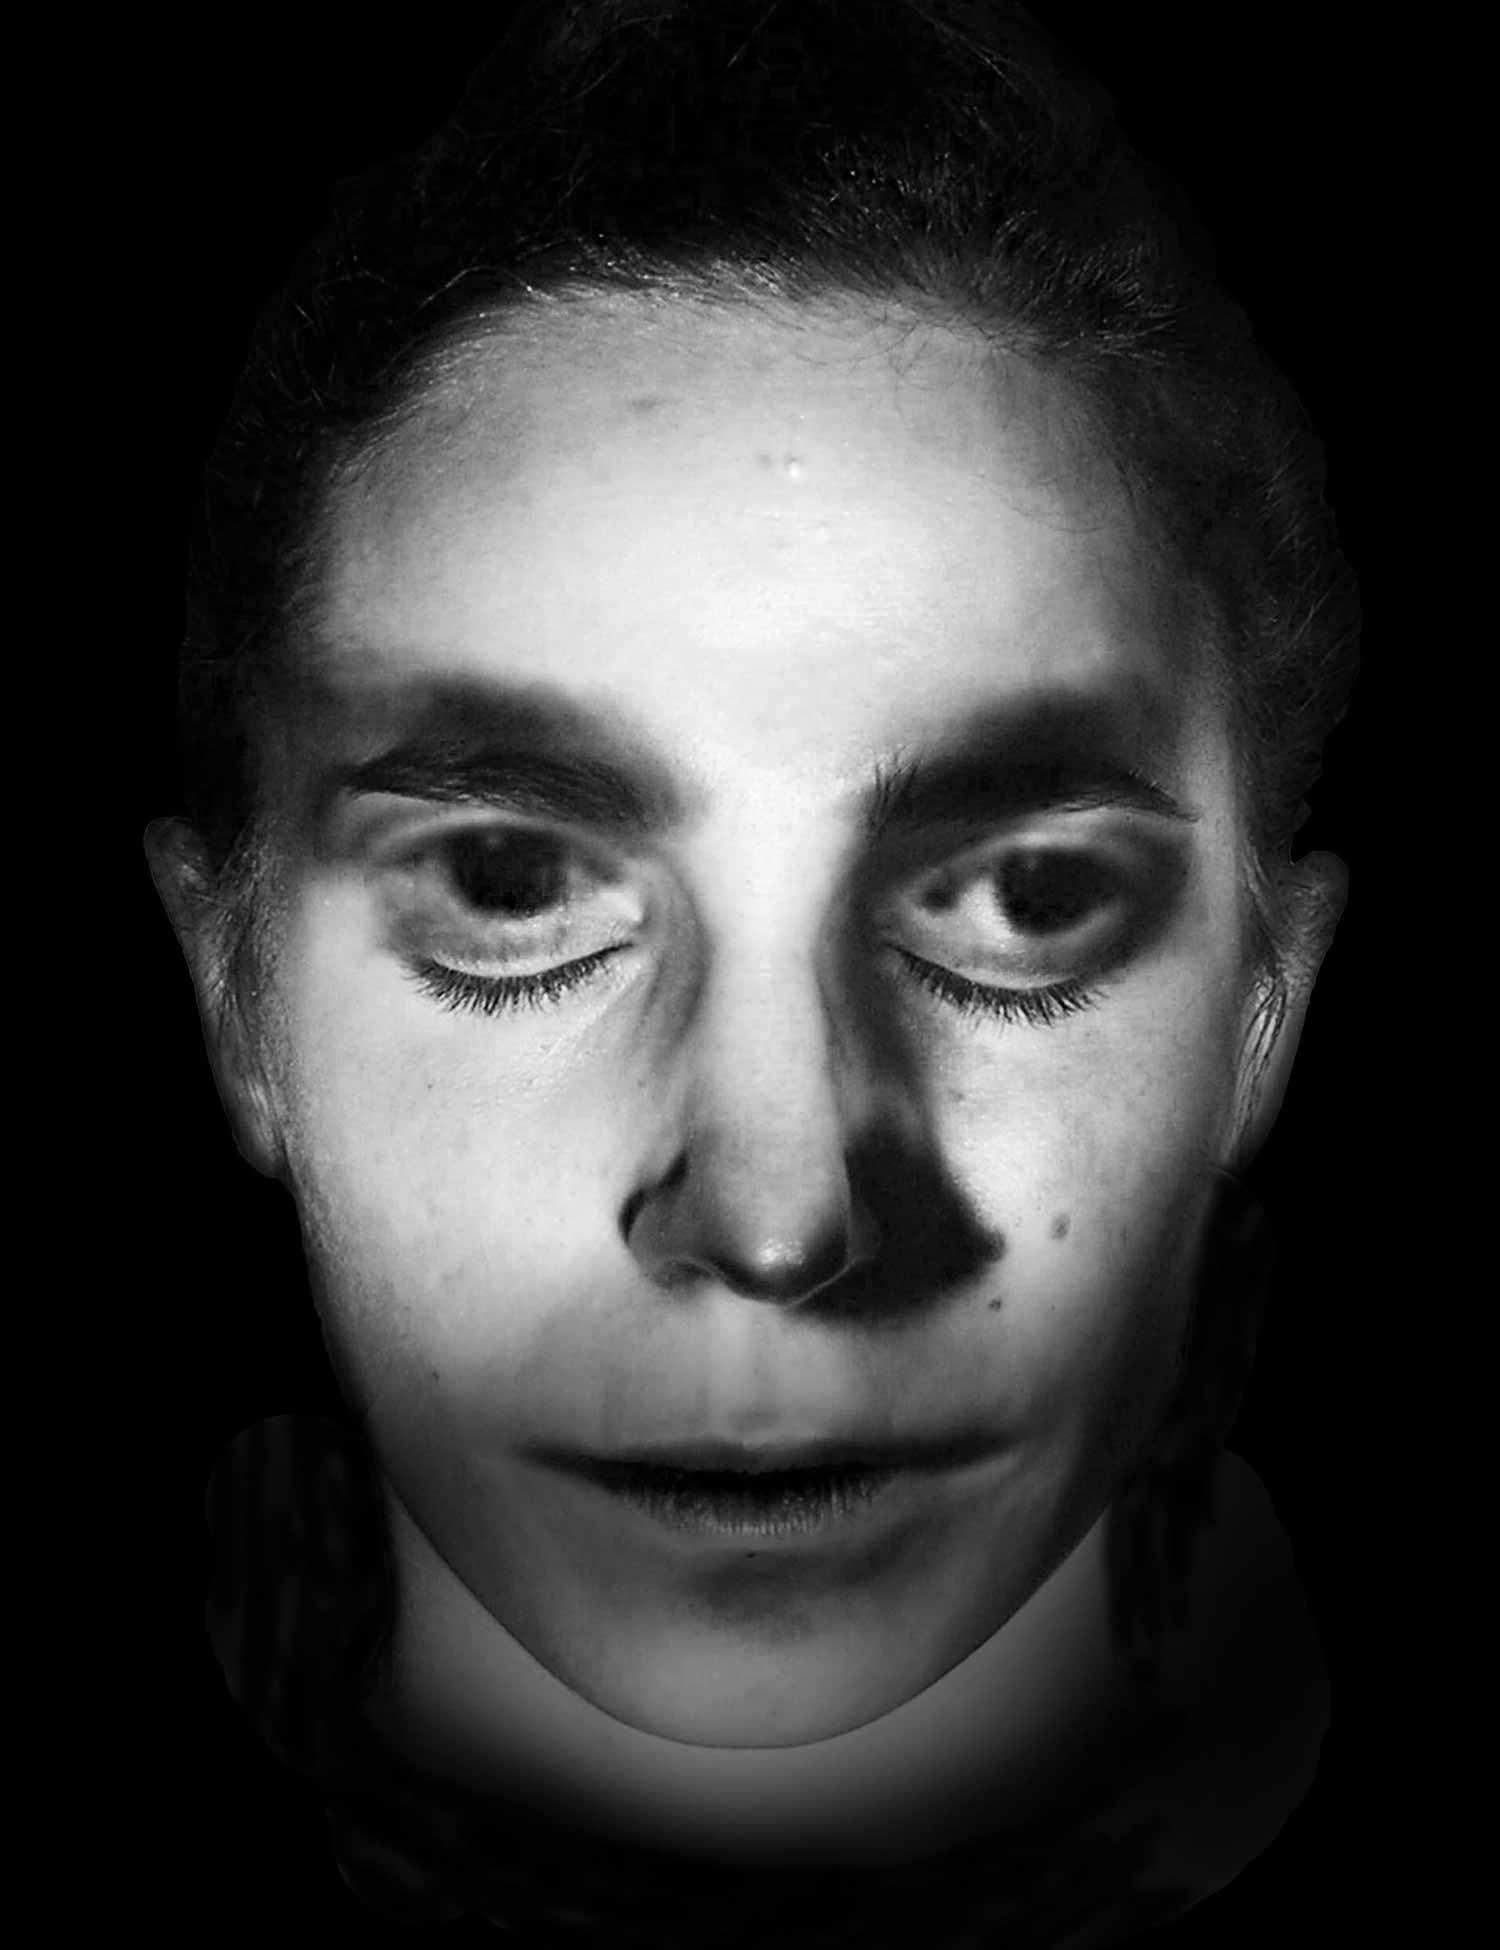 Juliette Seban – fantomes photos – Jul